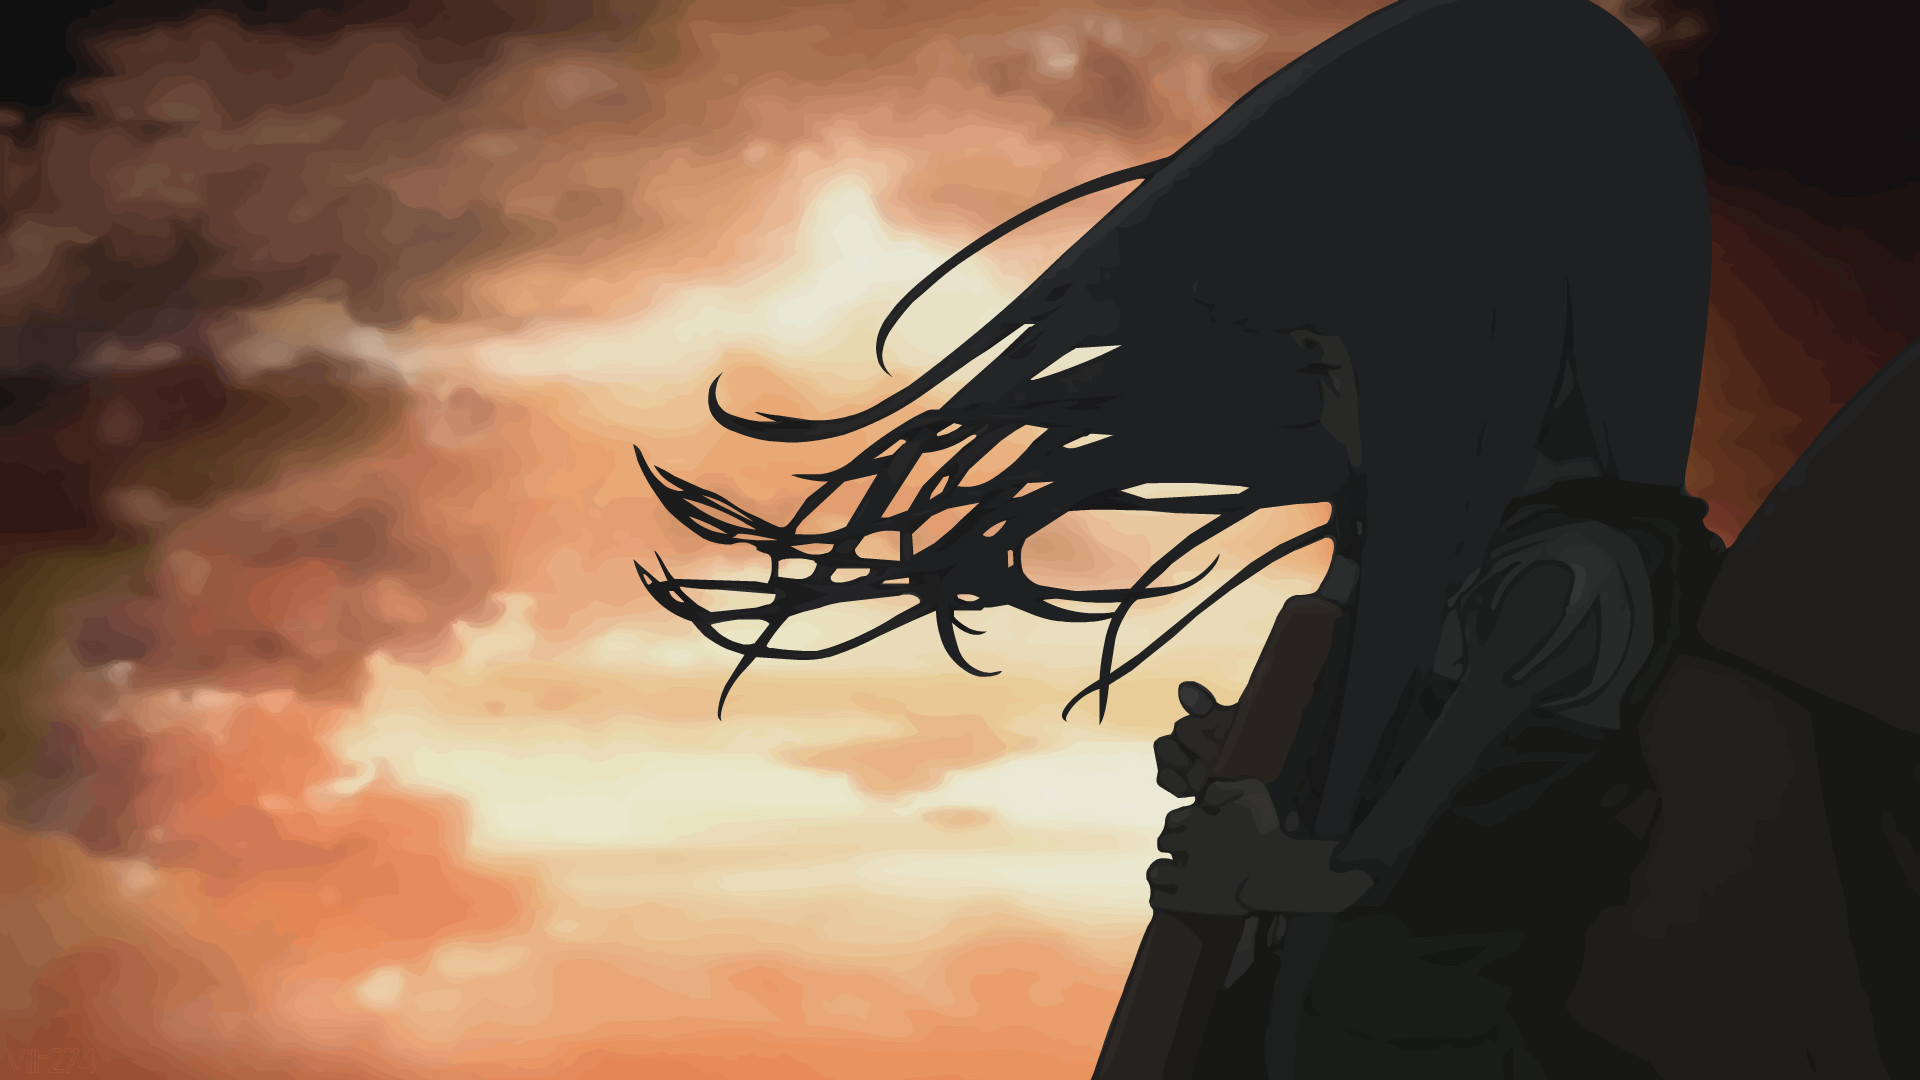 Res: 1920x1080, Anime - Ergo Proxy Anime Wallpaper